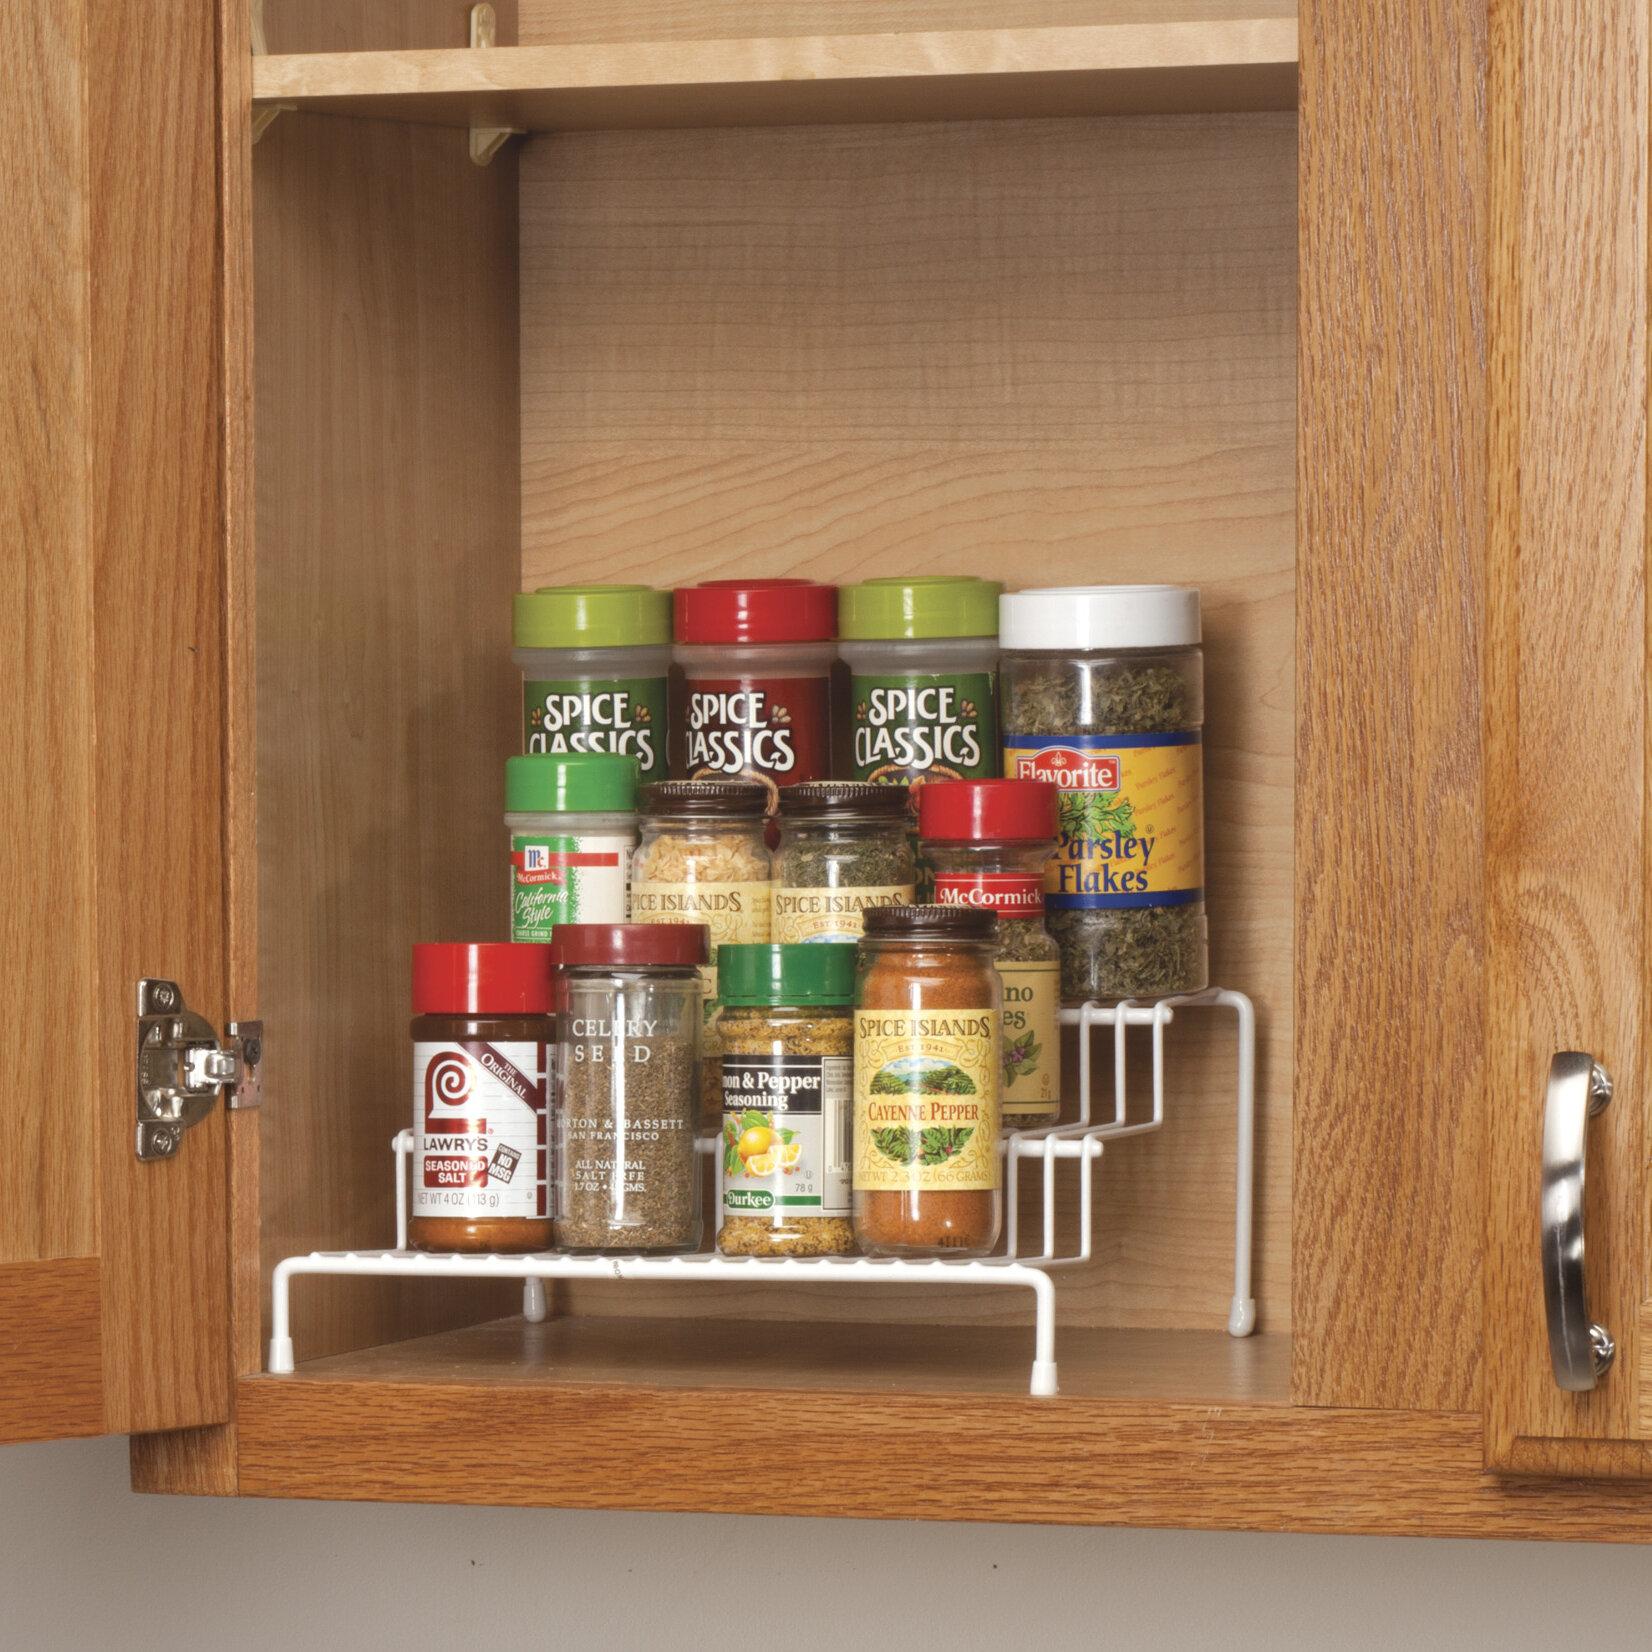 walter drake cabinet spice rack wayfair rh wayfair com over the cabinet hanging spice rack over the cabinet door spice rack